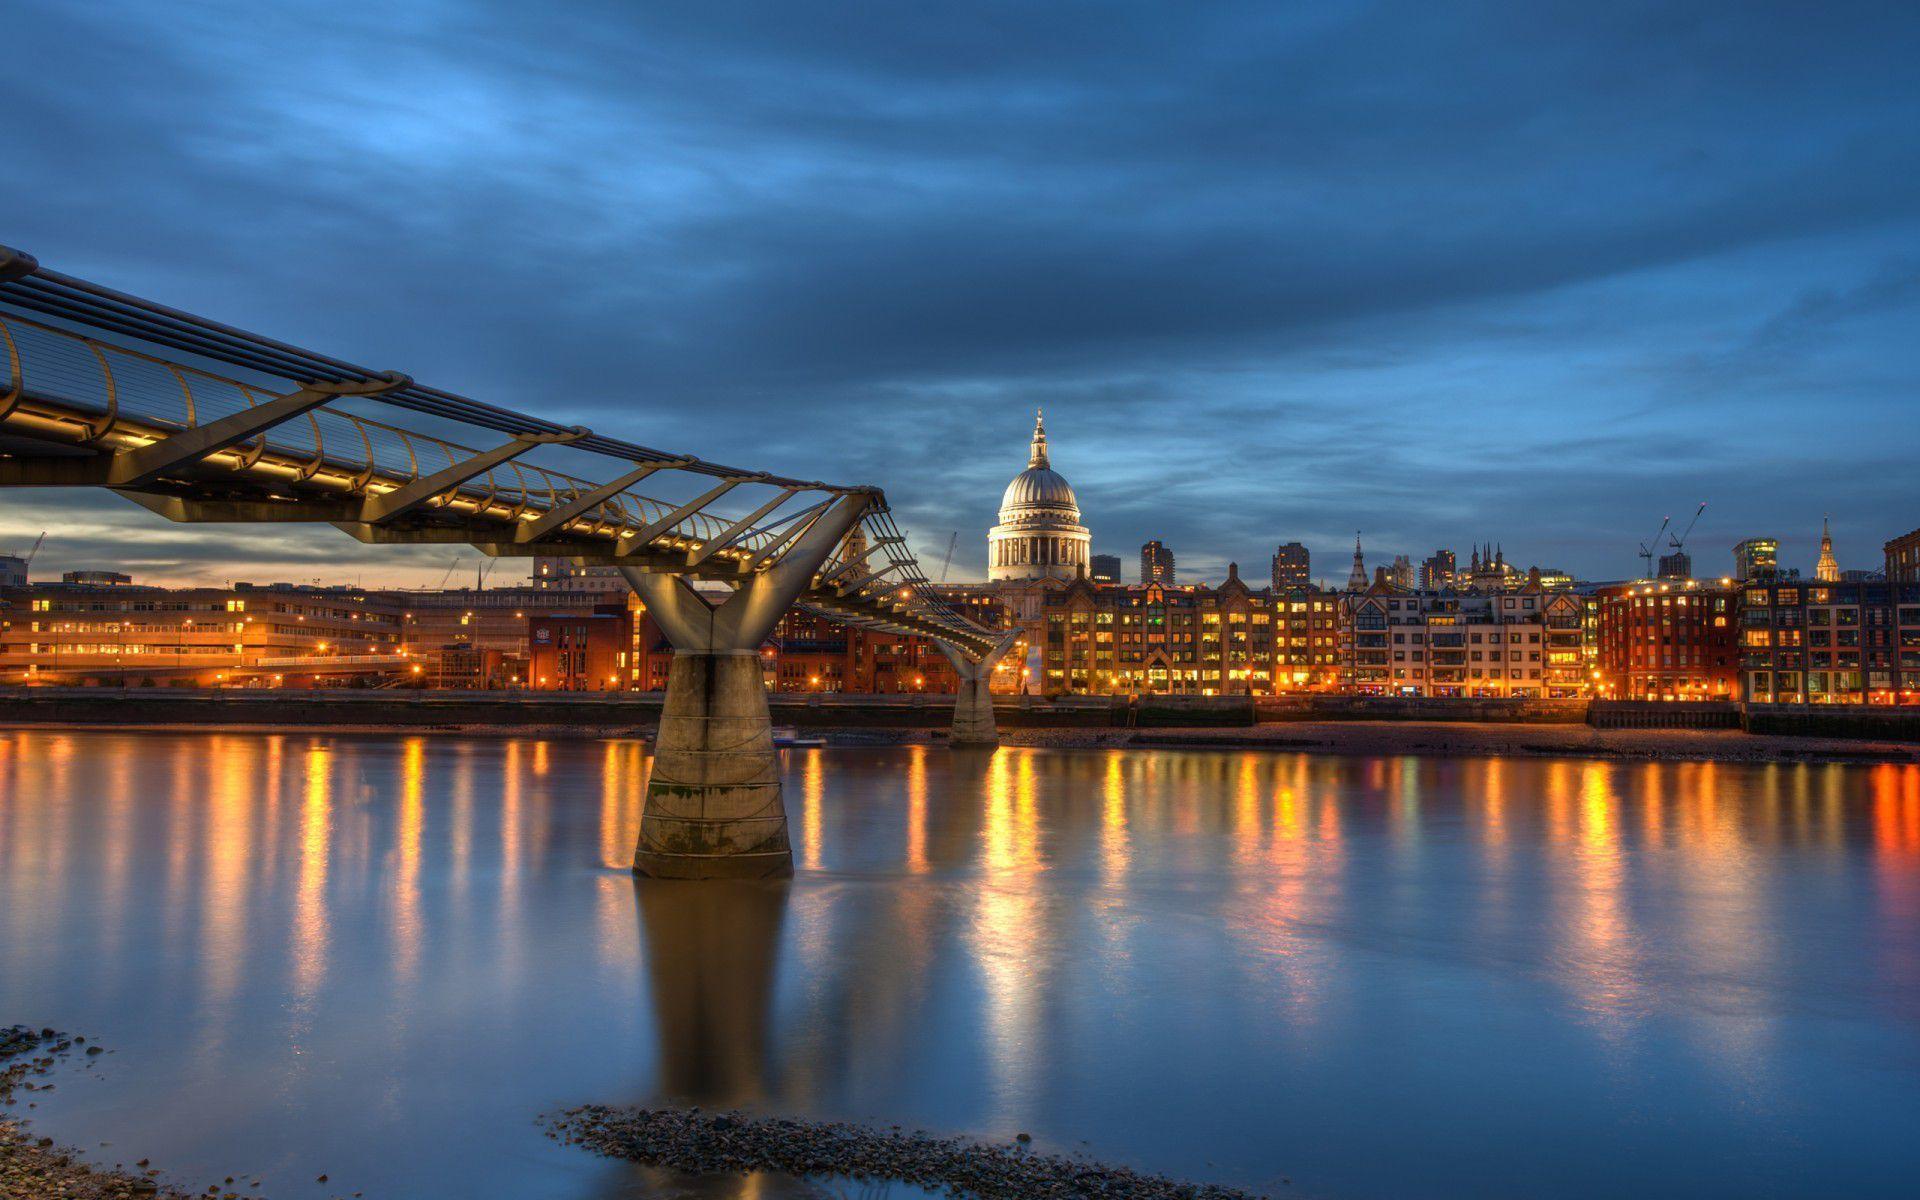 london wallpaper wallpaperwallpapersfree - photo #5